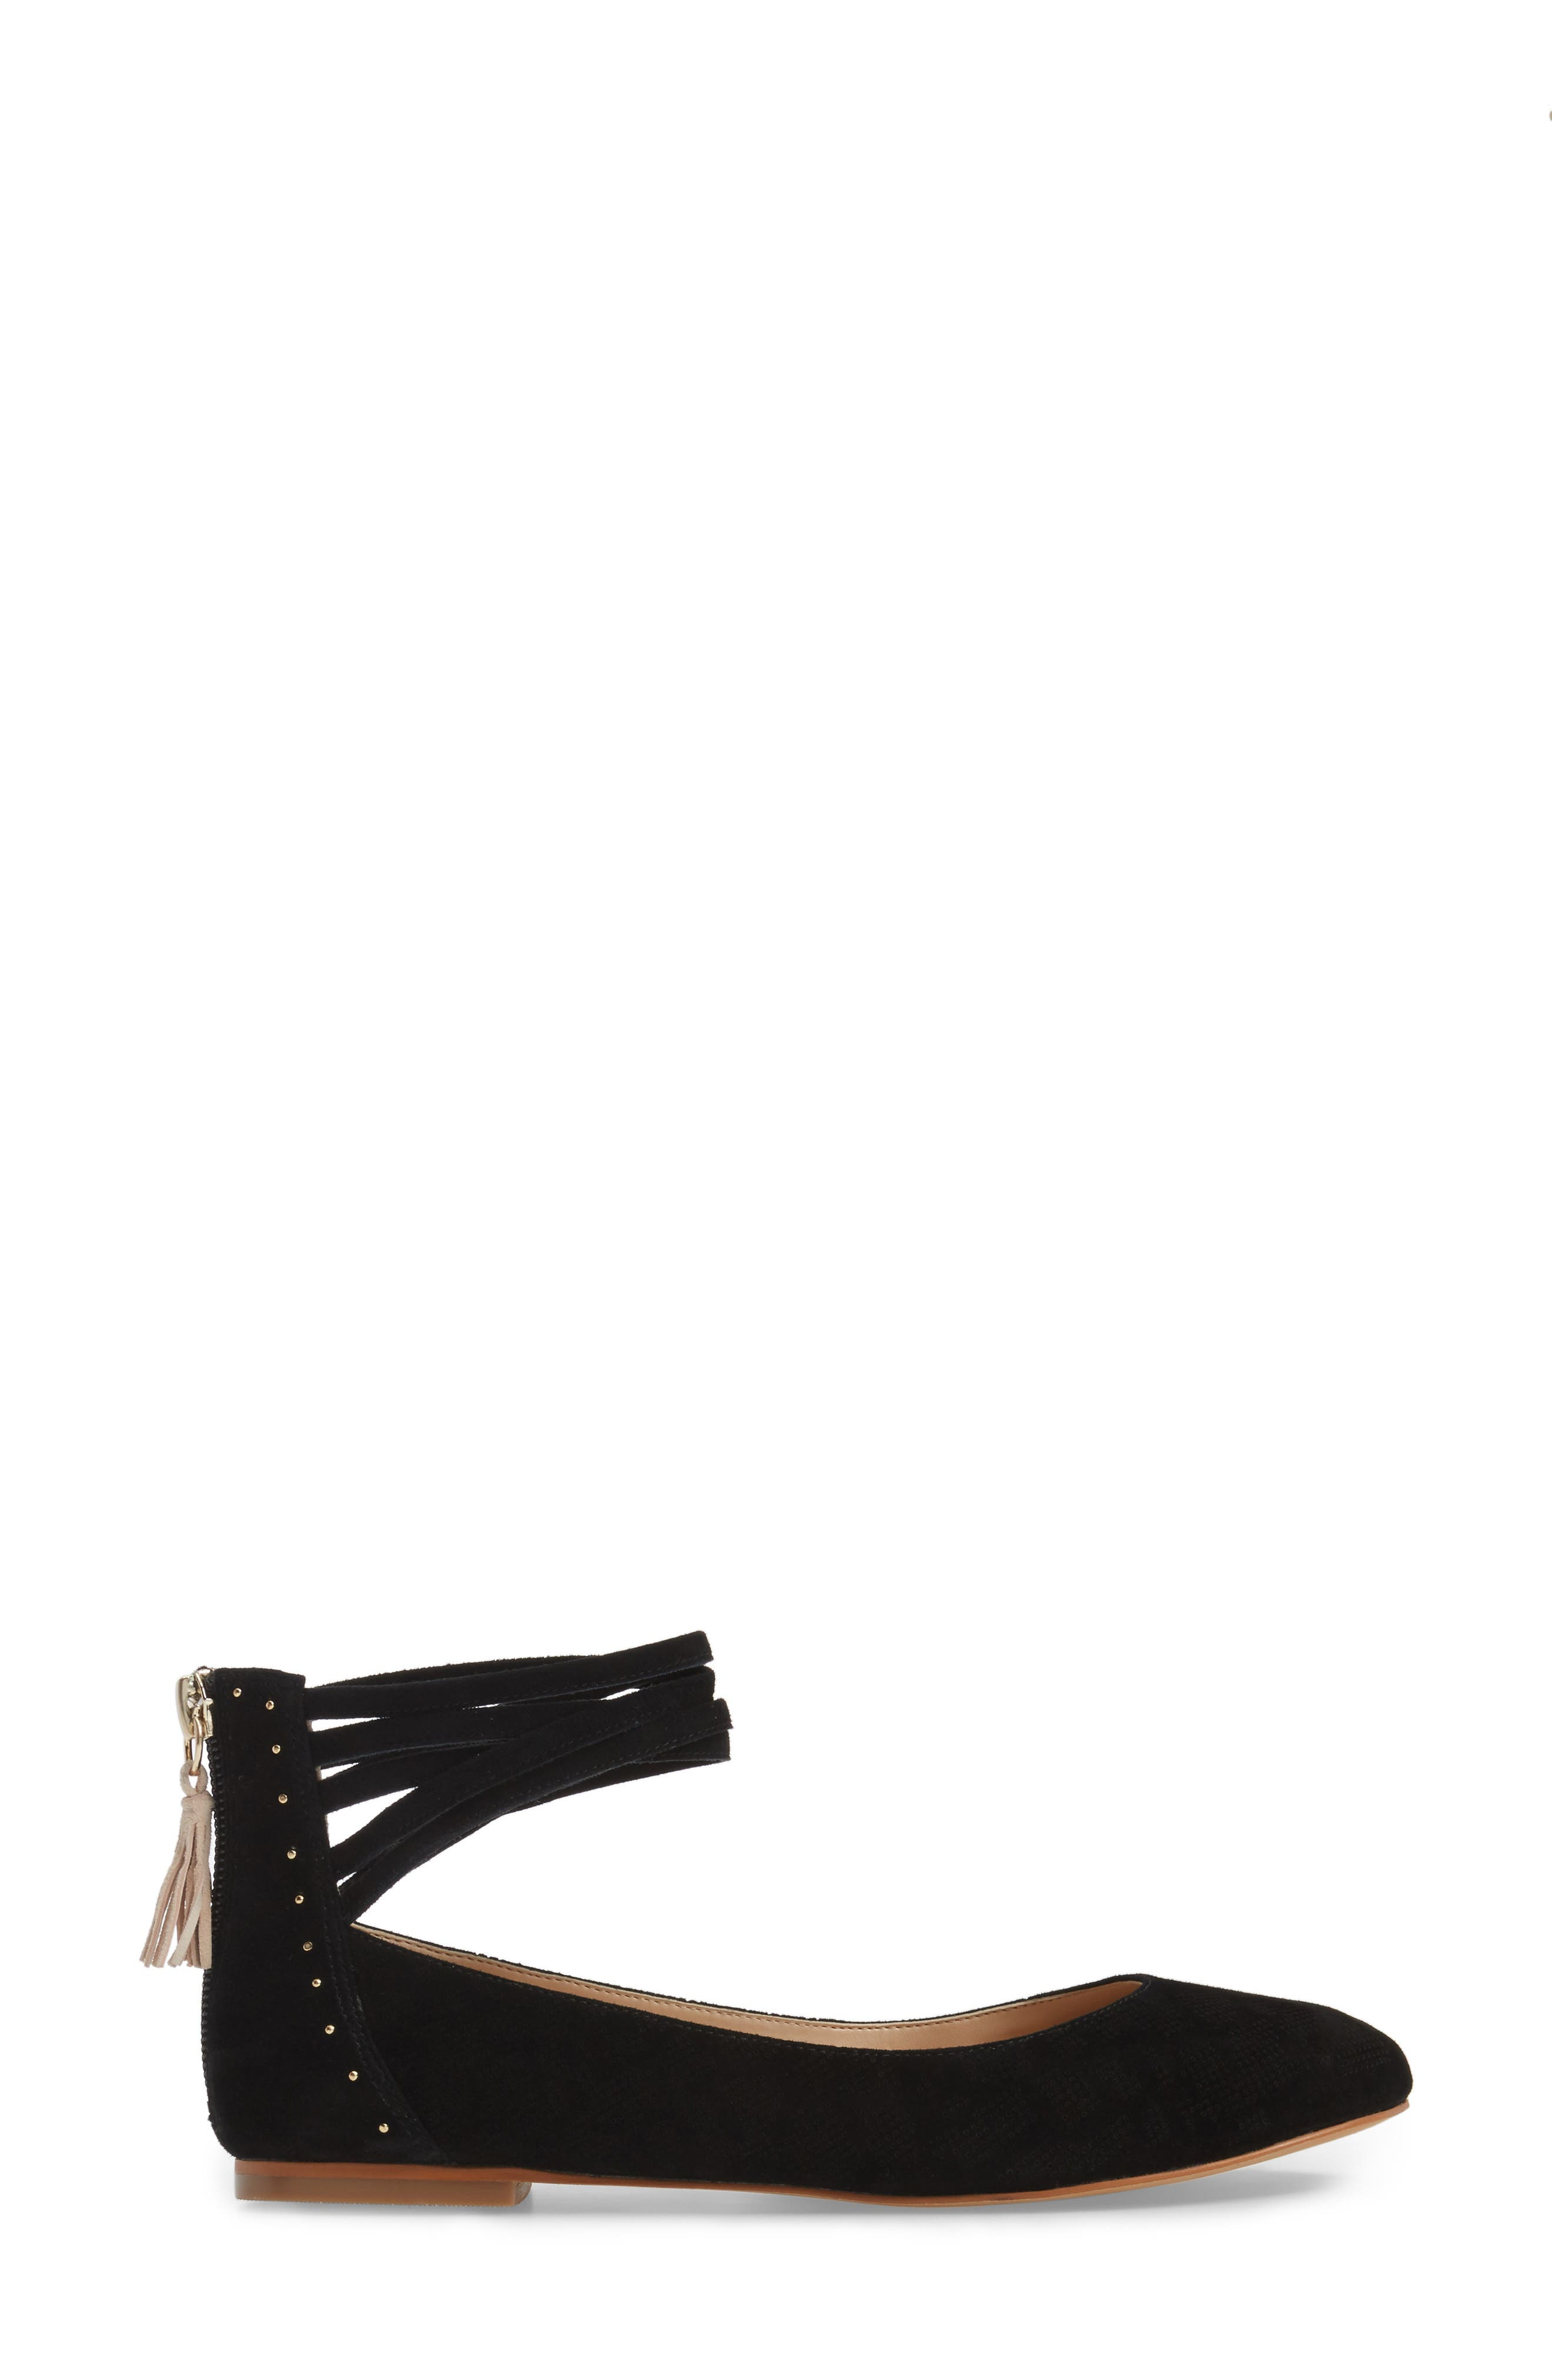 Alternate Image 3  - Dr. Scholl's Vonne Ankle Wrap Ballet Flat (Women)